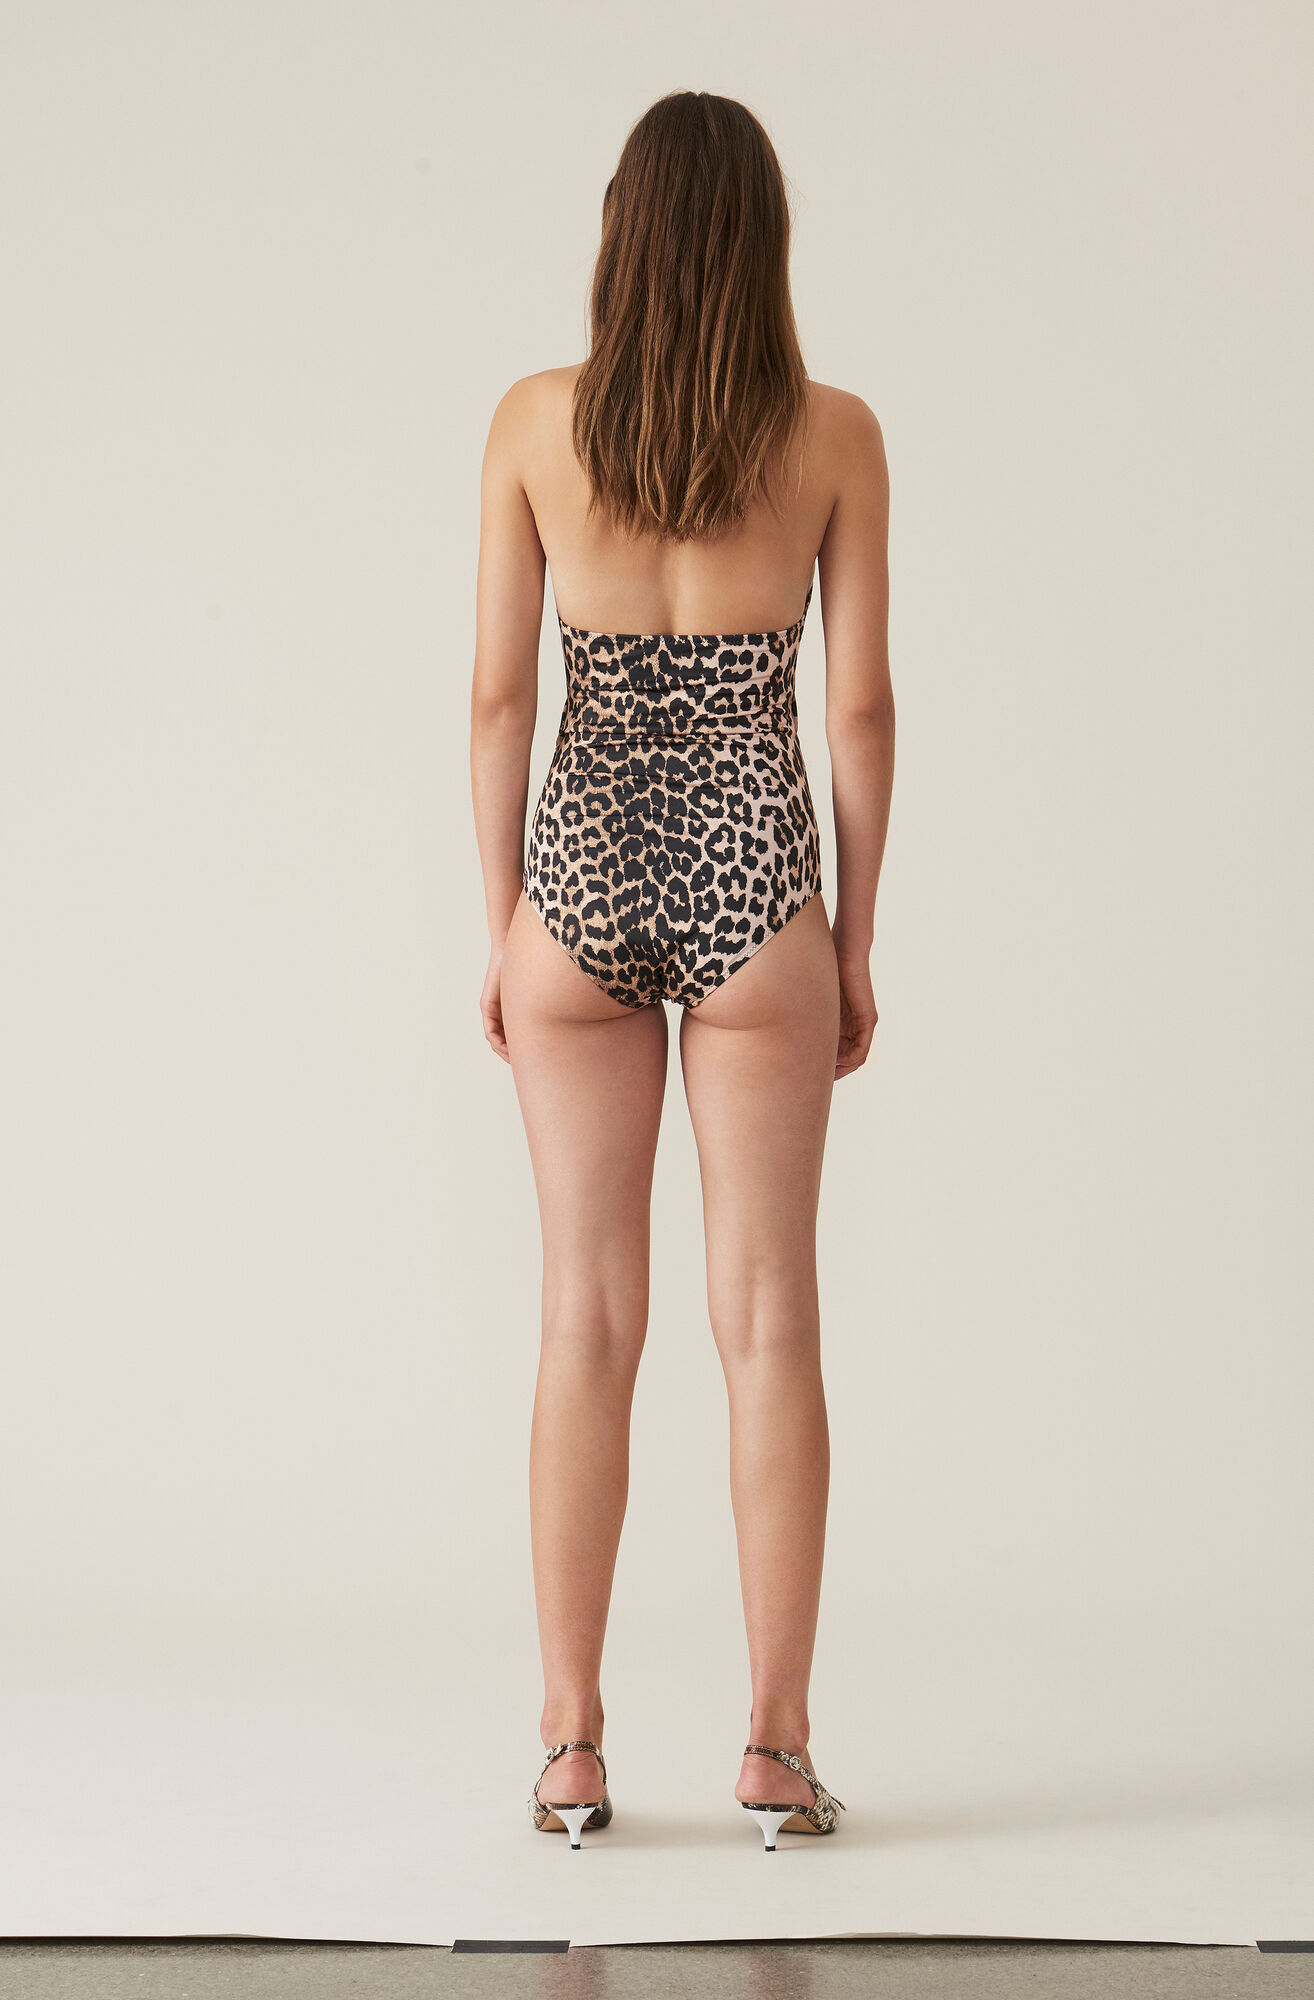 All-over Print Swimwear Badedragt, Leopard, hi-res